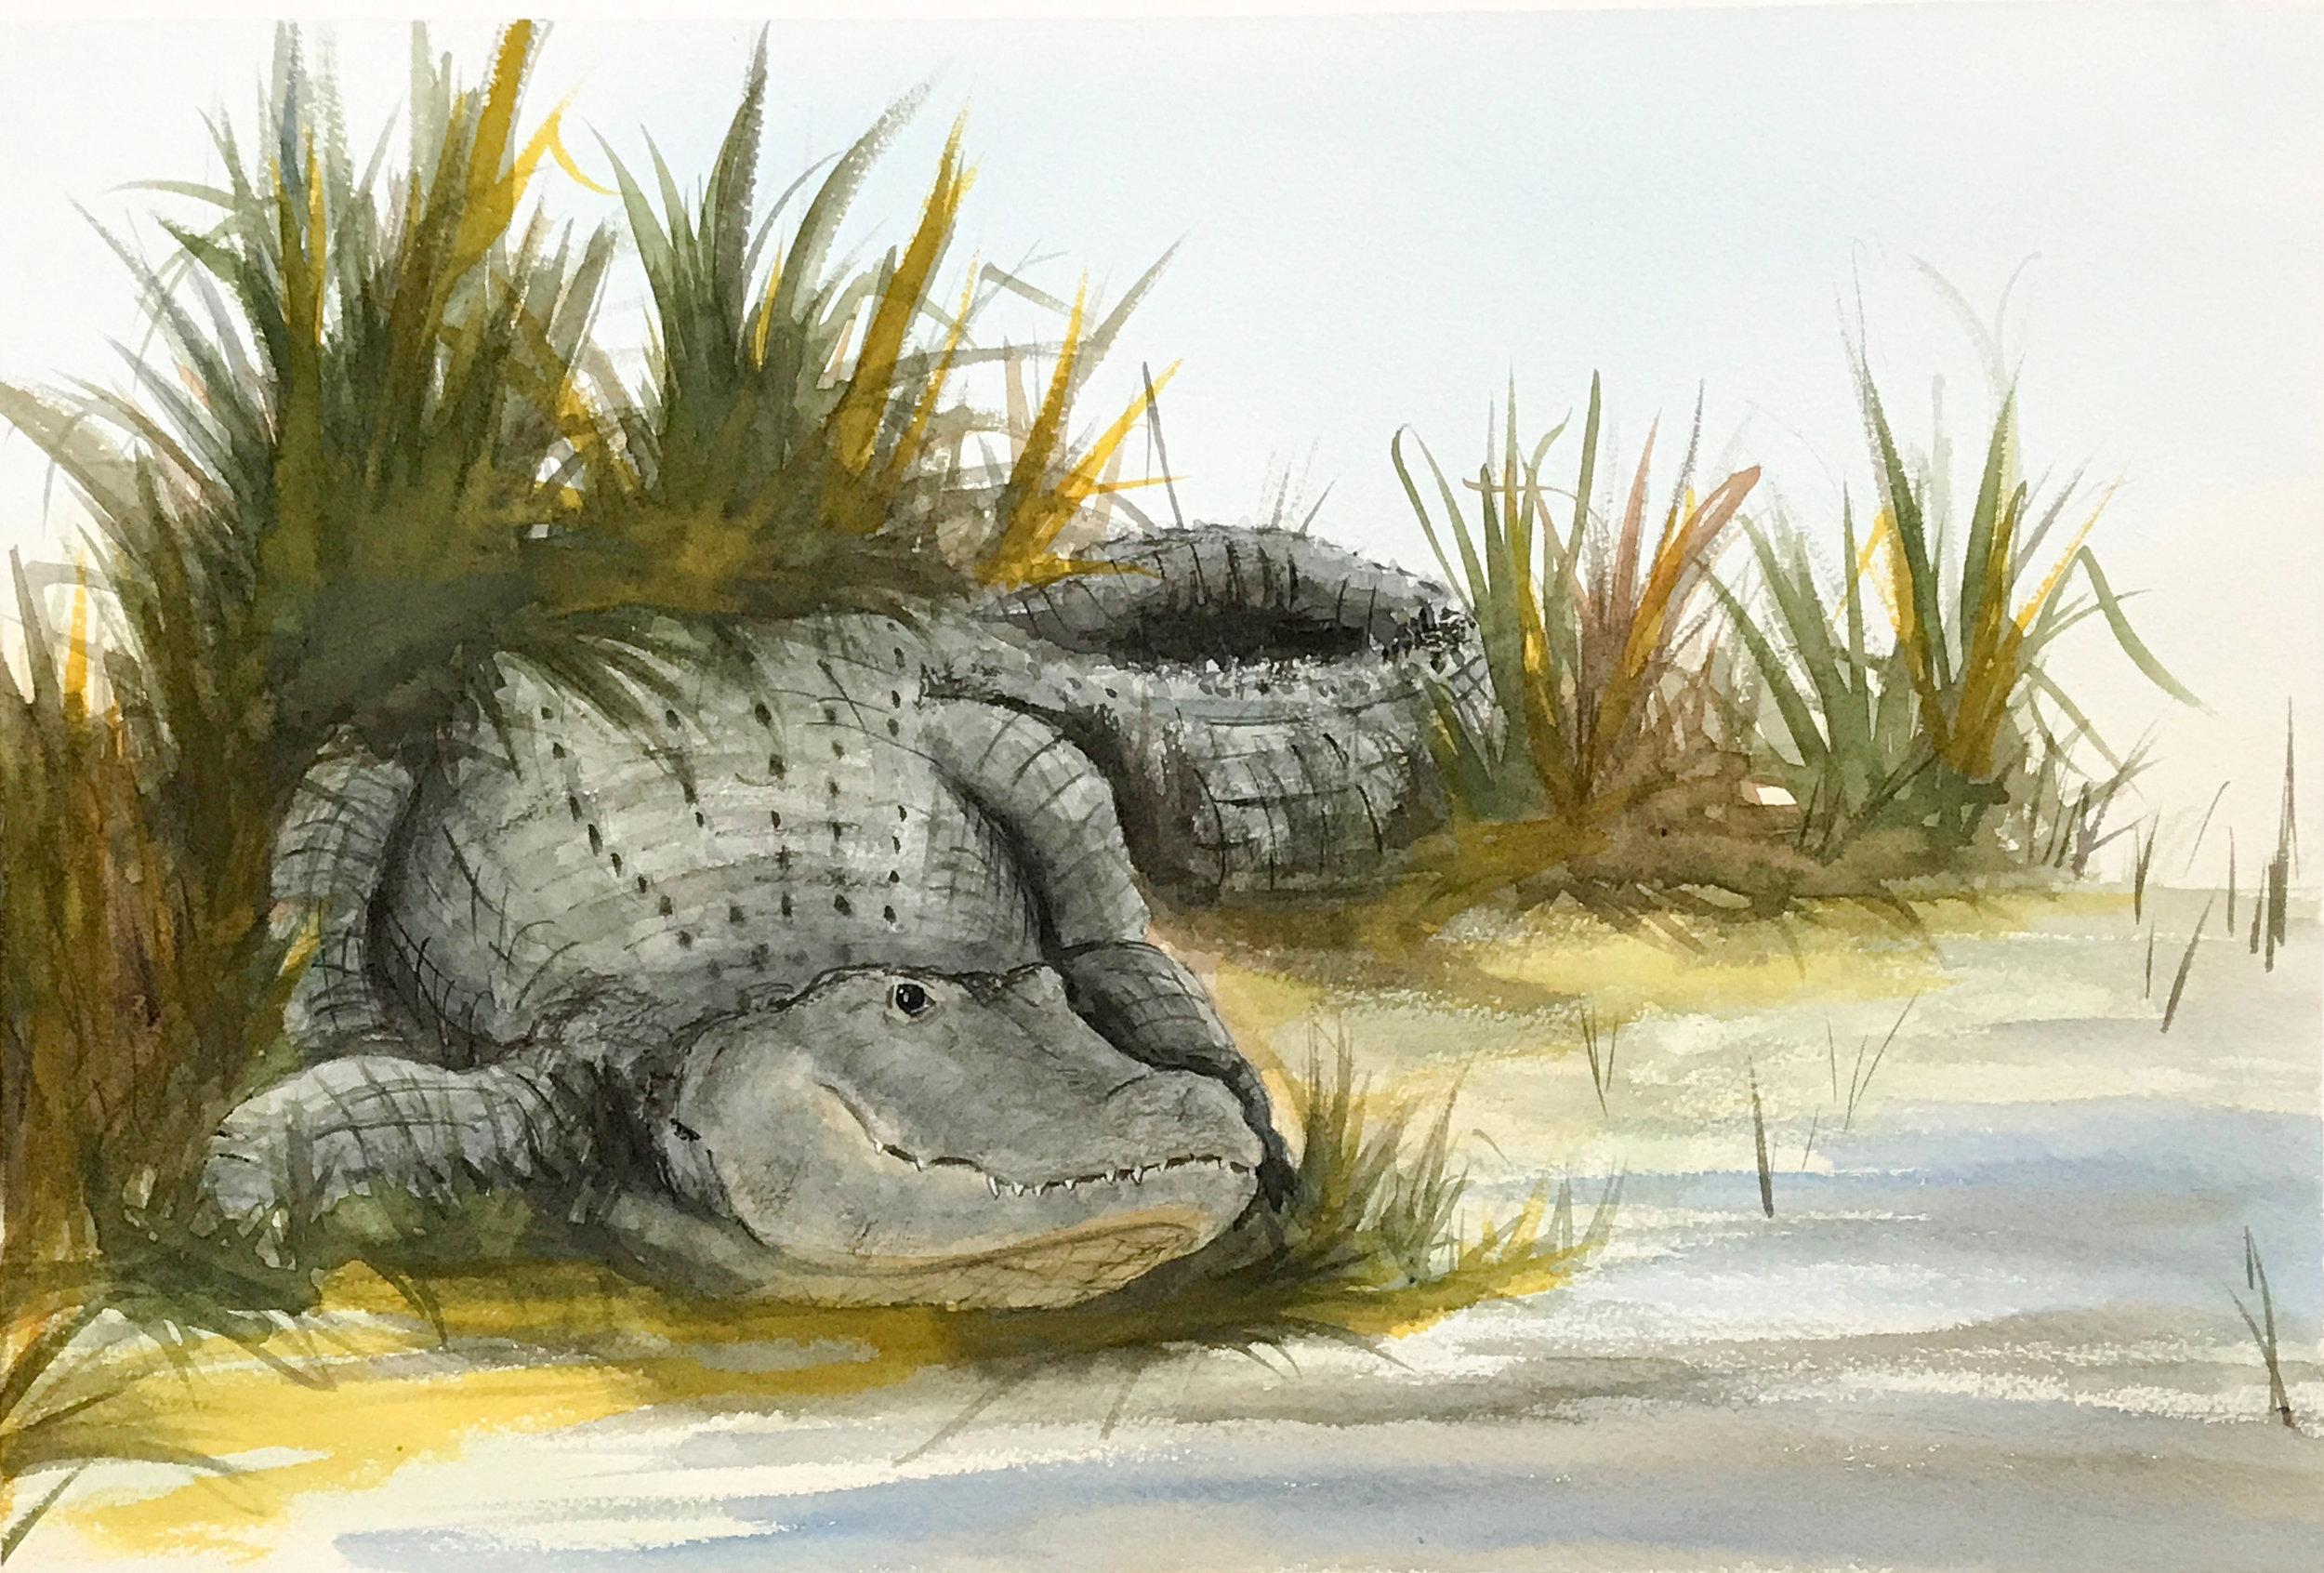 Holland_gator_watercolor.jpg